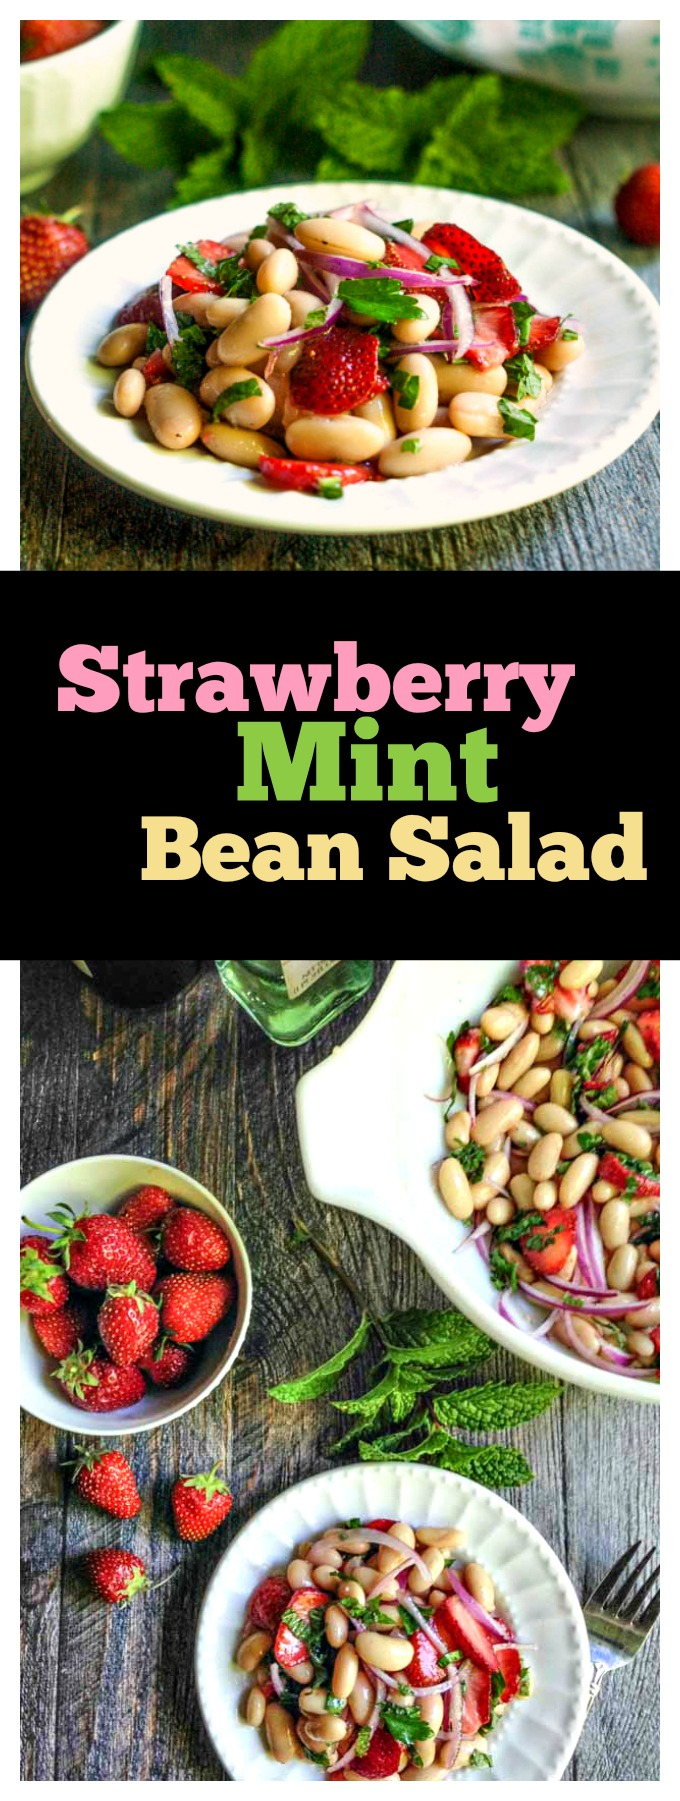 strawberry-mint-bean-salad-pin